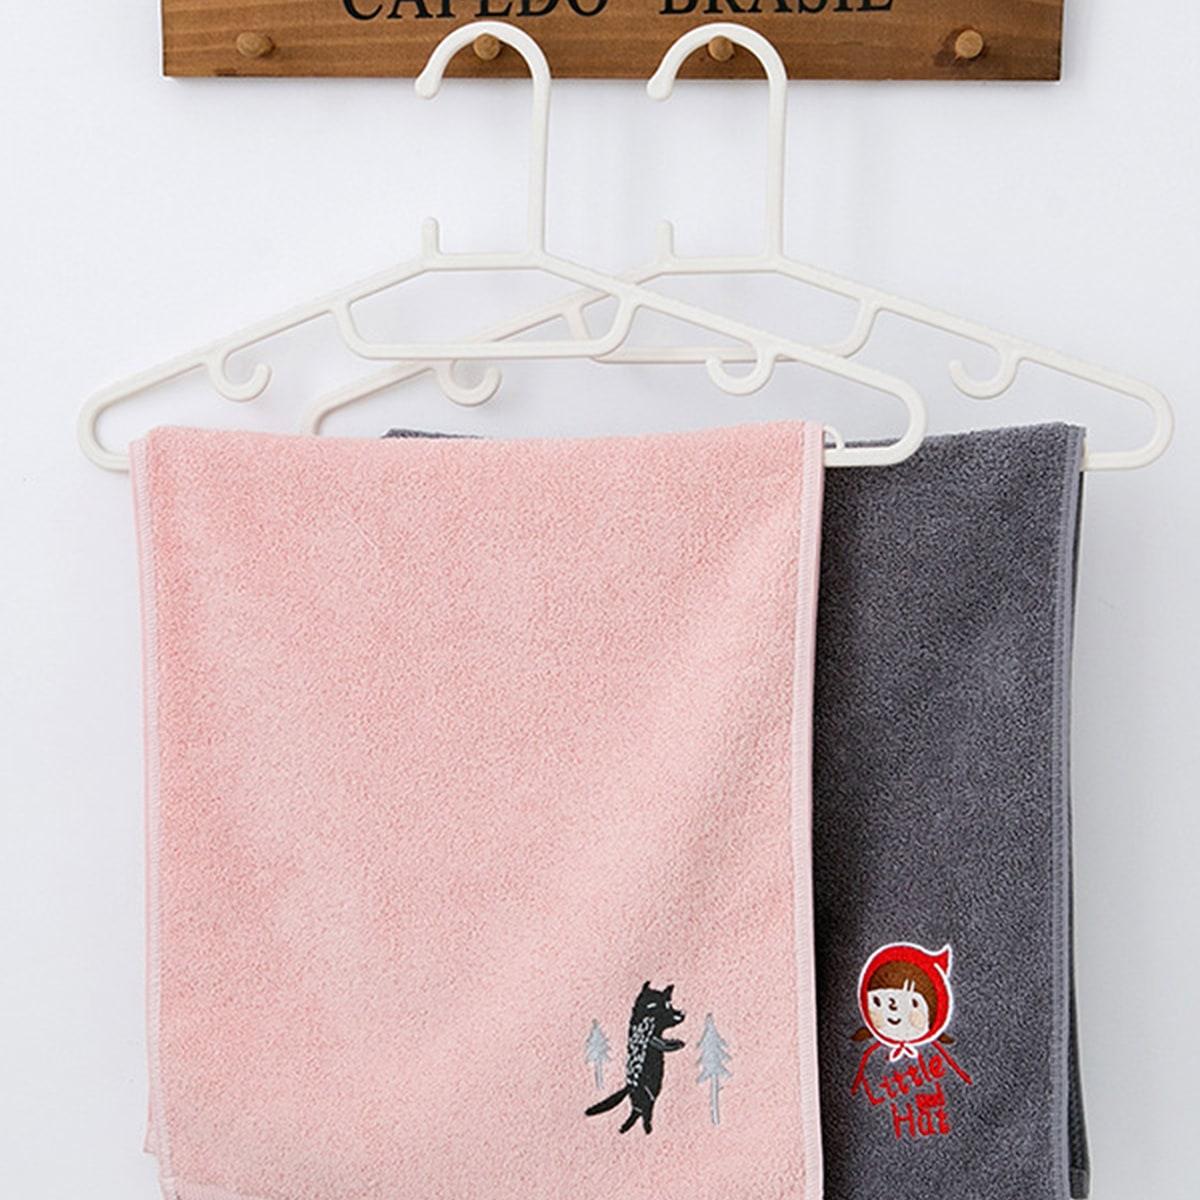 1pc cartoon patroon borduurwerk handdoek